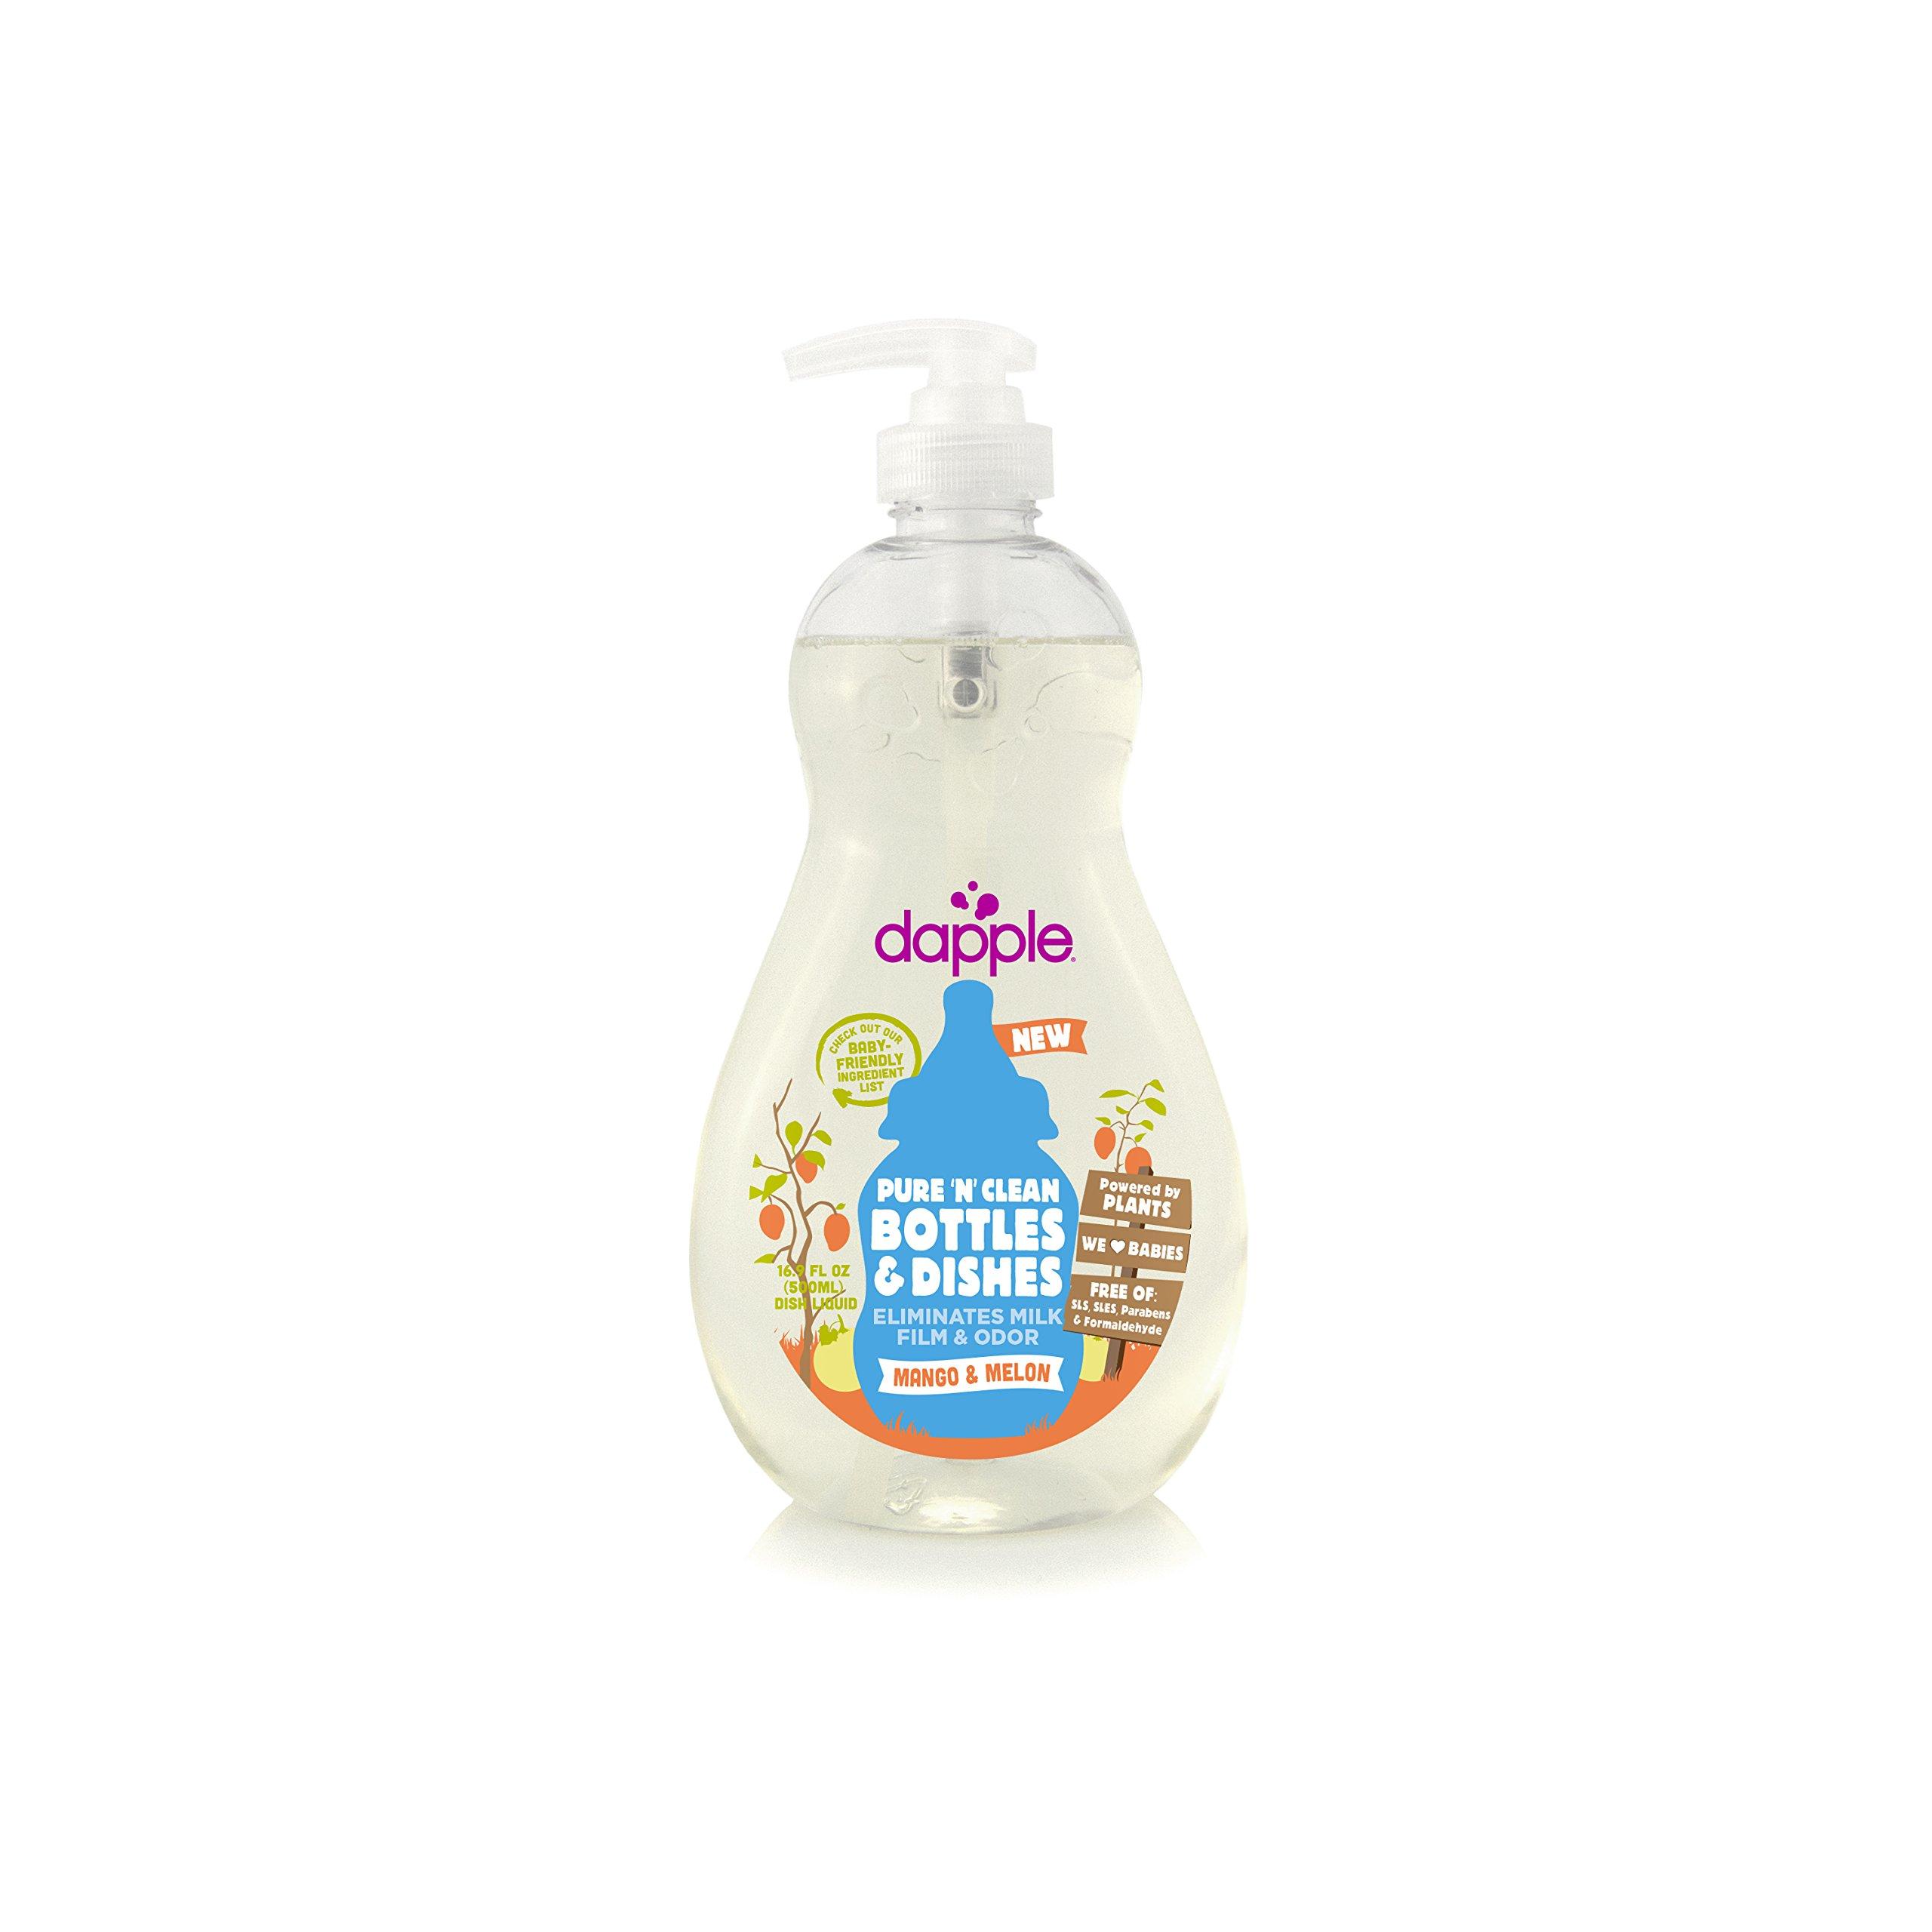 Dapple Baby Bottle & Dish Liquid, Mango/Melon, 16.9 Ounce